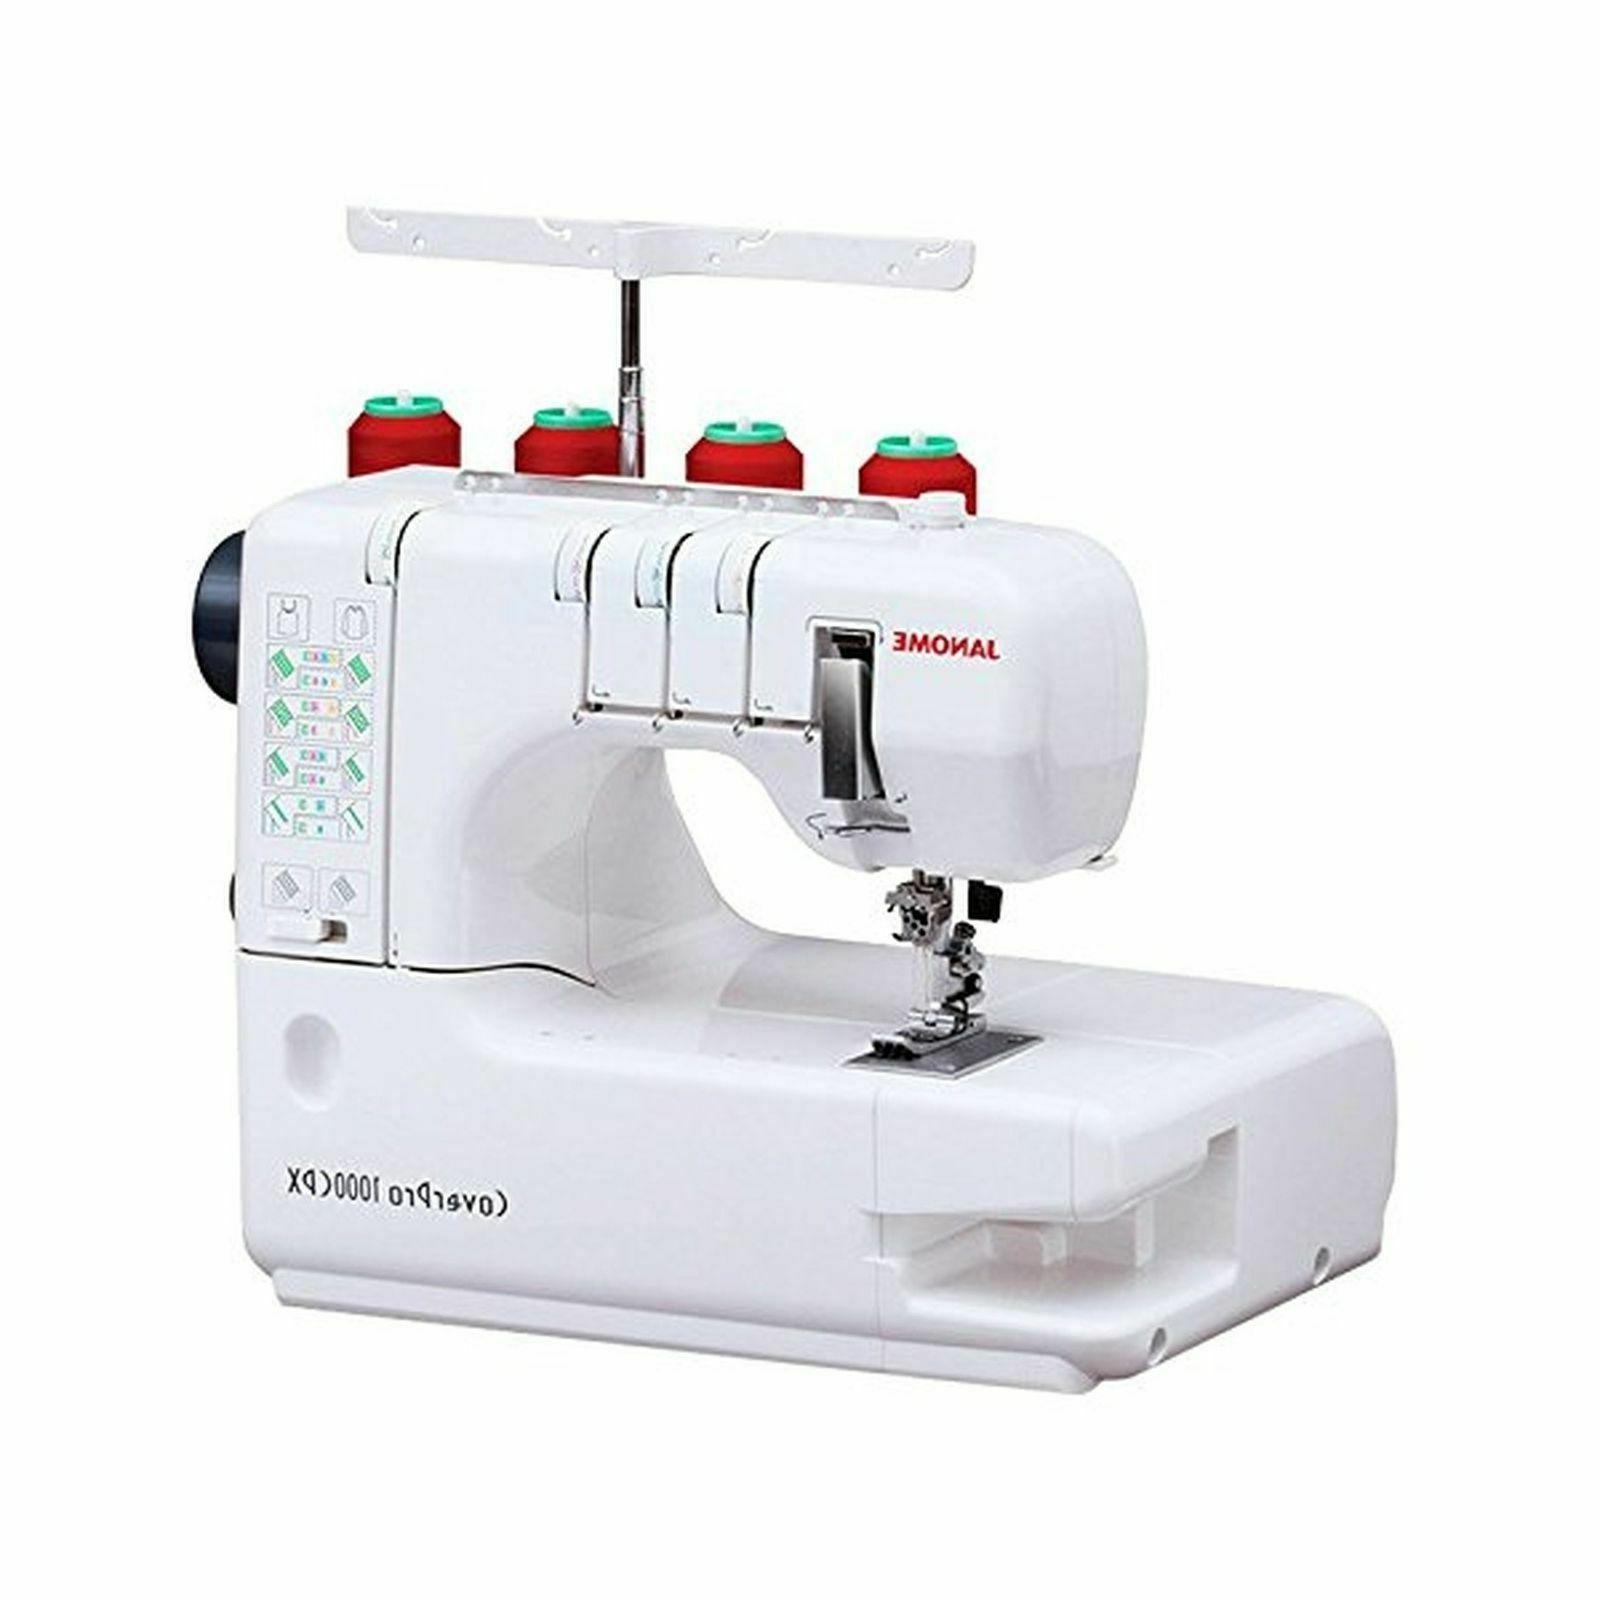 Janome Sewing Free